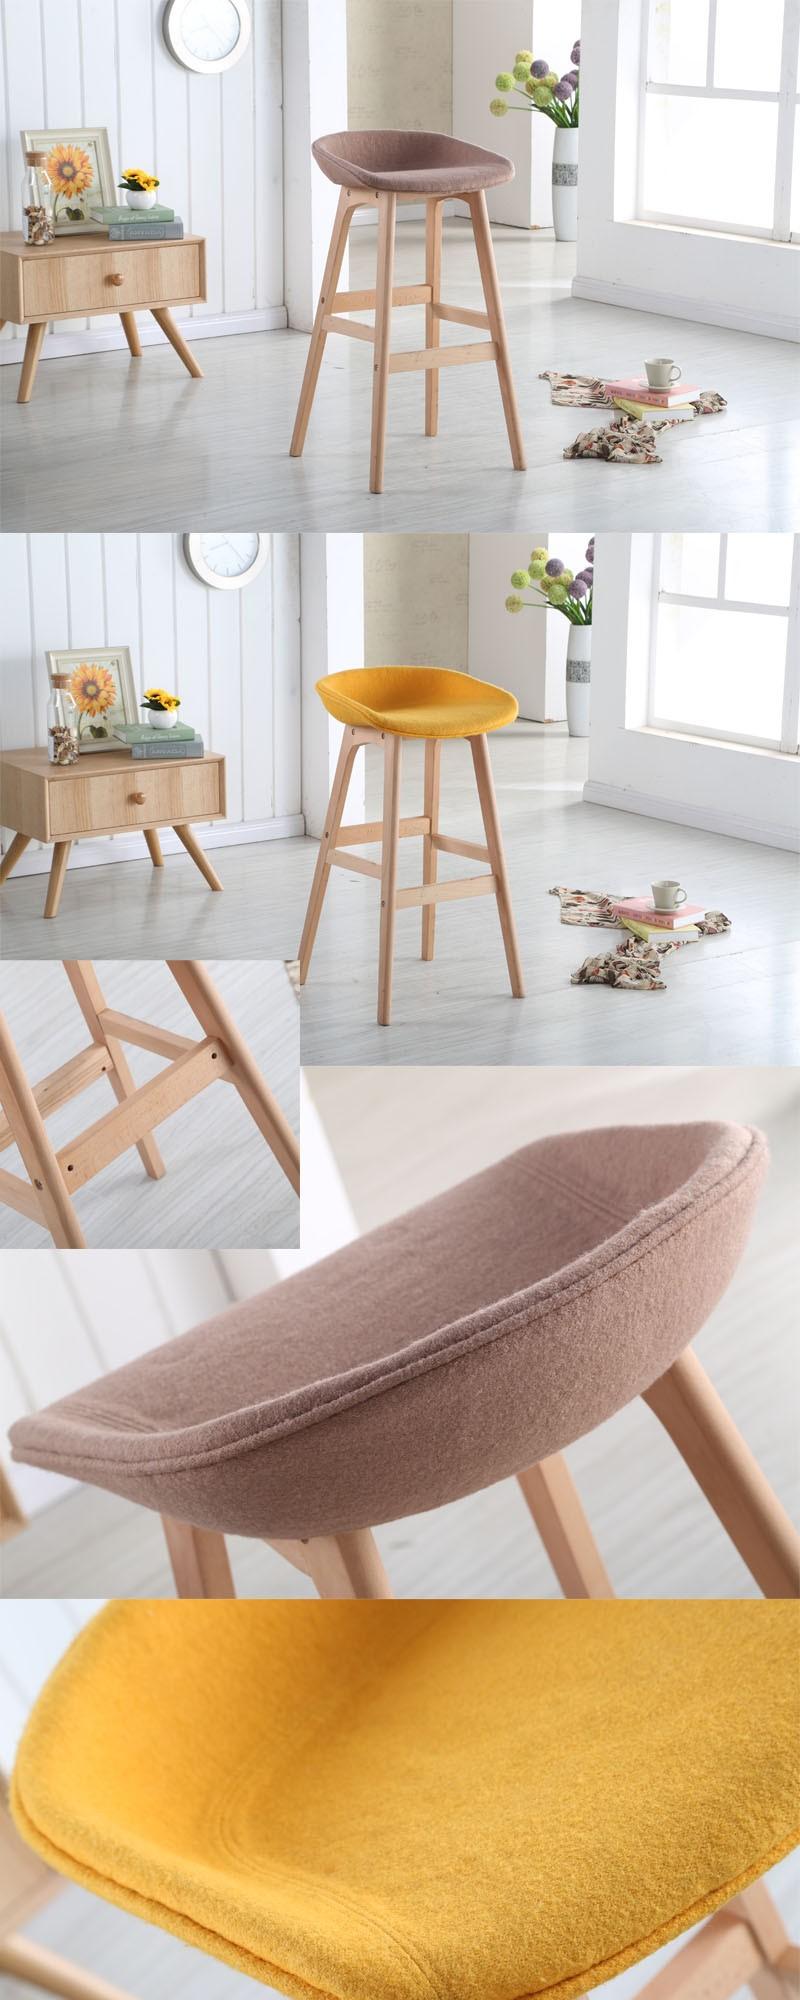 Europe popular metal base high fabric chair.jpg